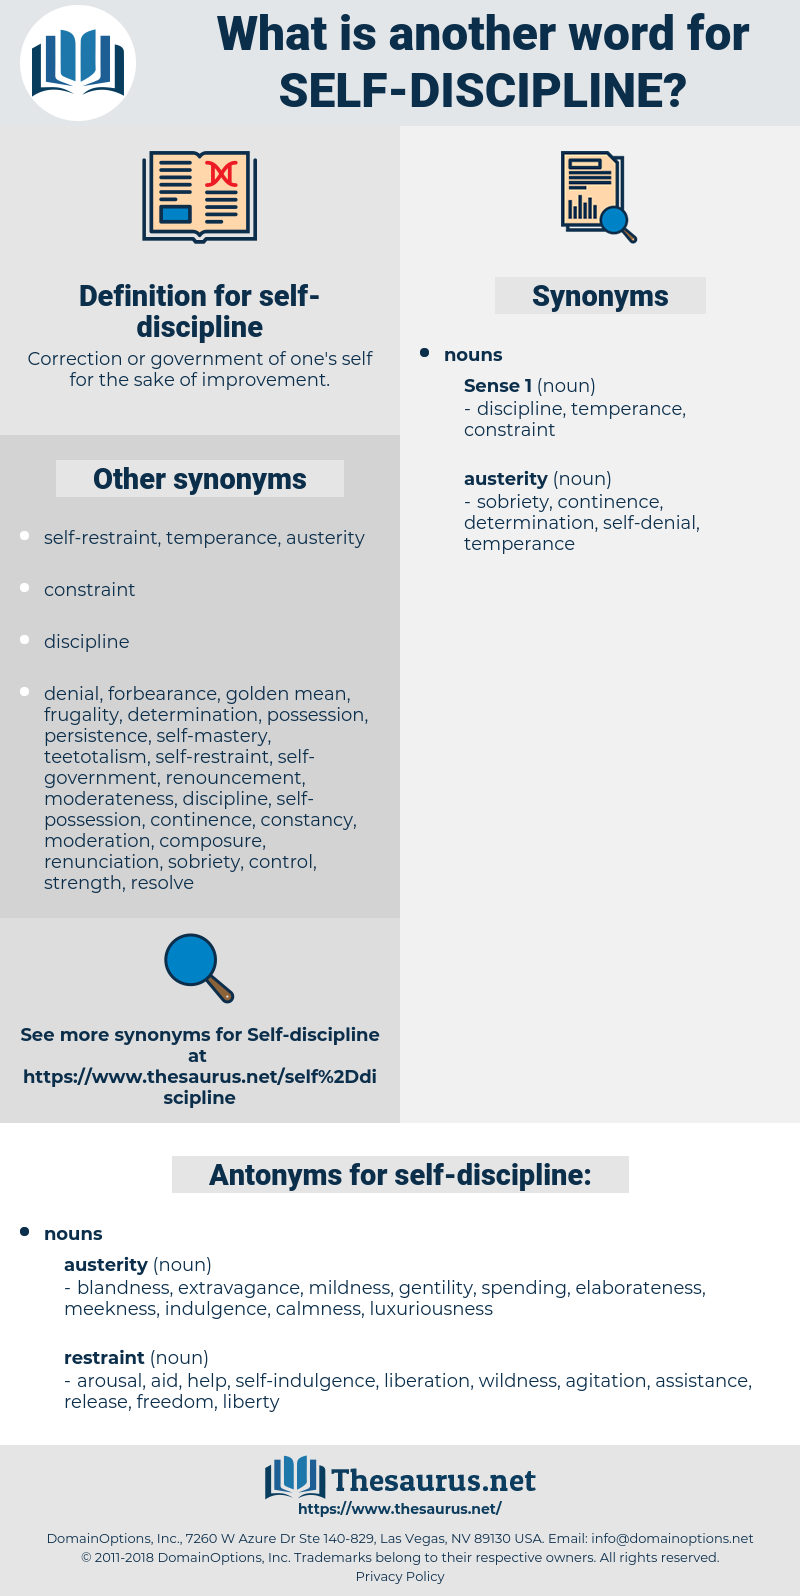 self-discipline, synonym self-discipline, another word for self-discipline, words like self-discipline, thesaurus self-discipline